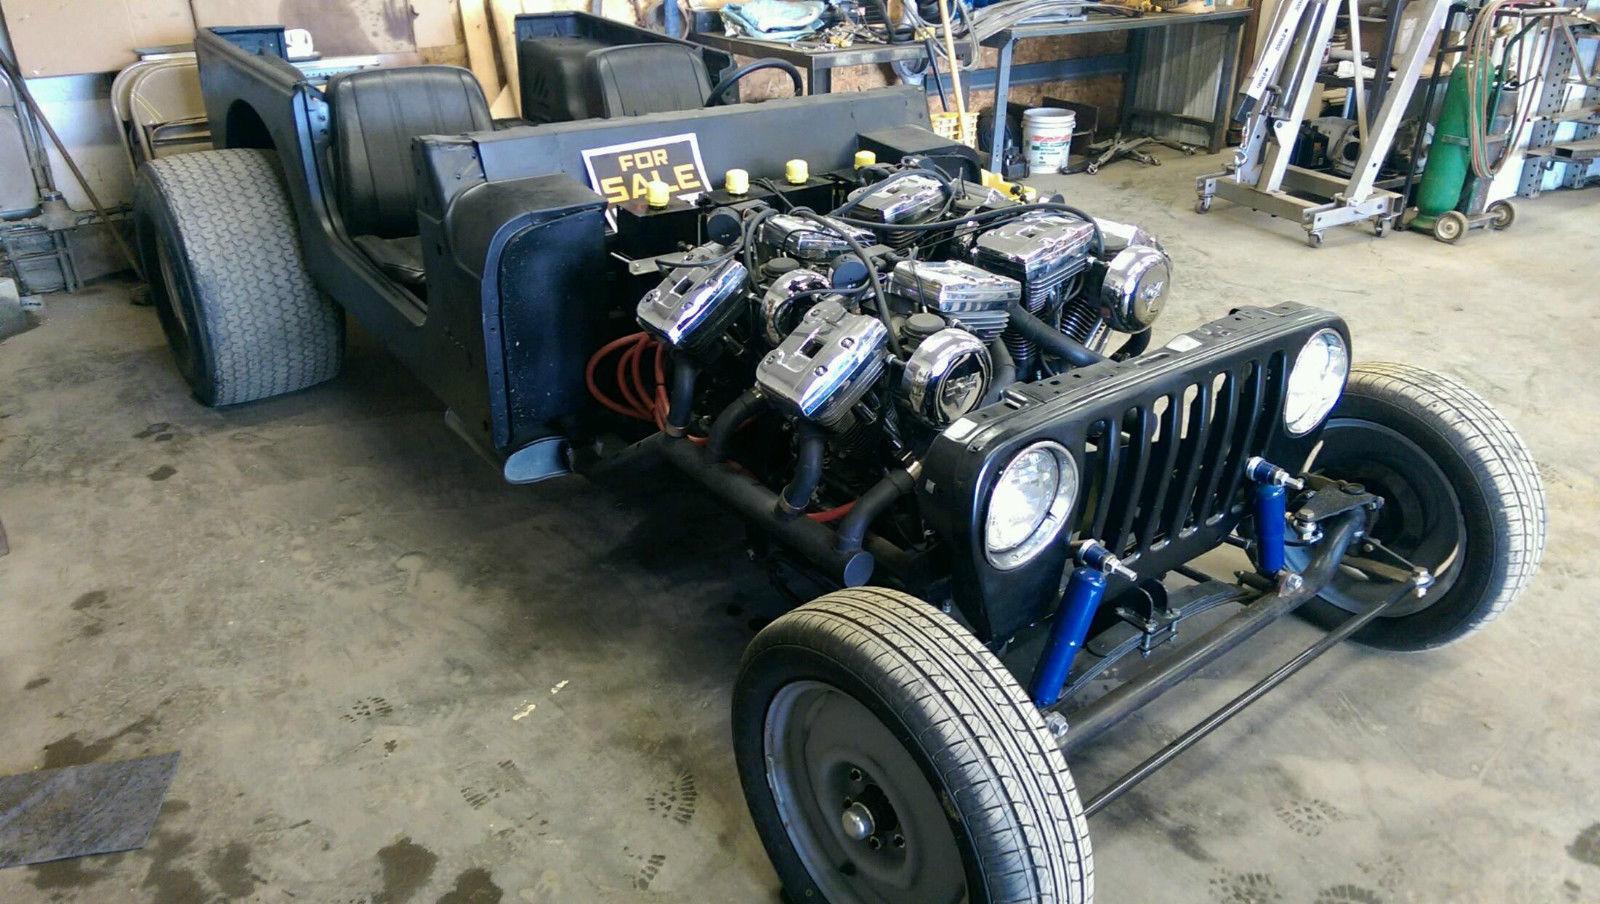 Harley Davidson V Twin Engine Diagrams Trusted Wiring Evo Diagram Antique Clip Art